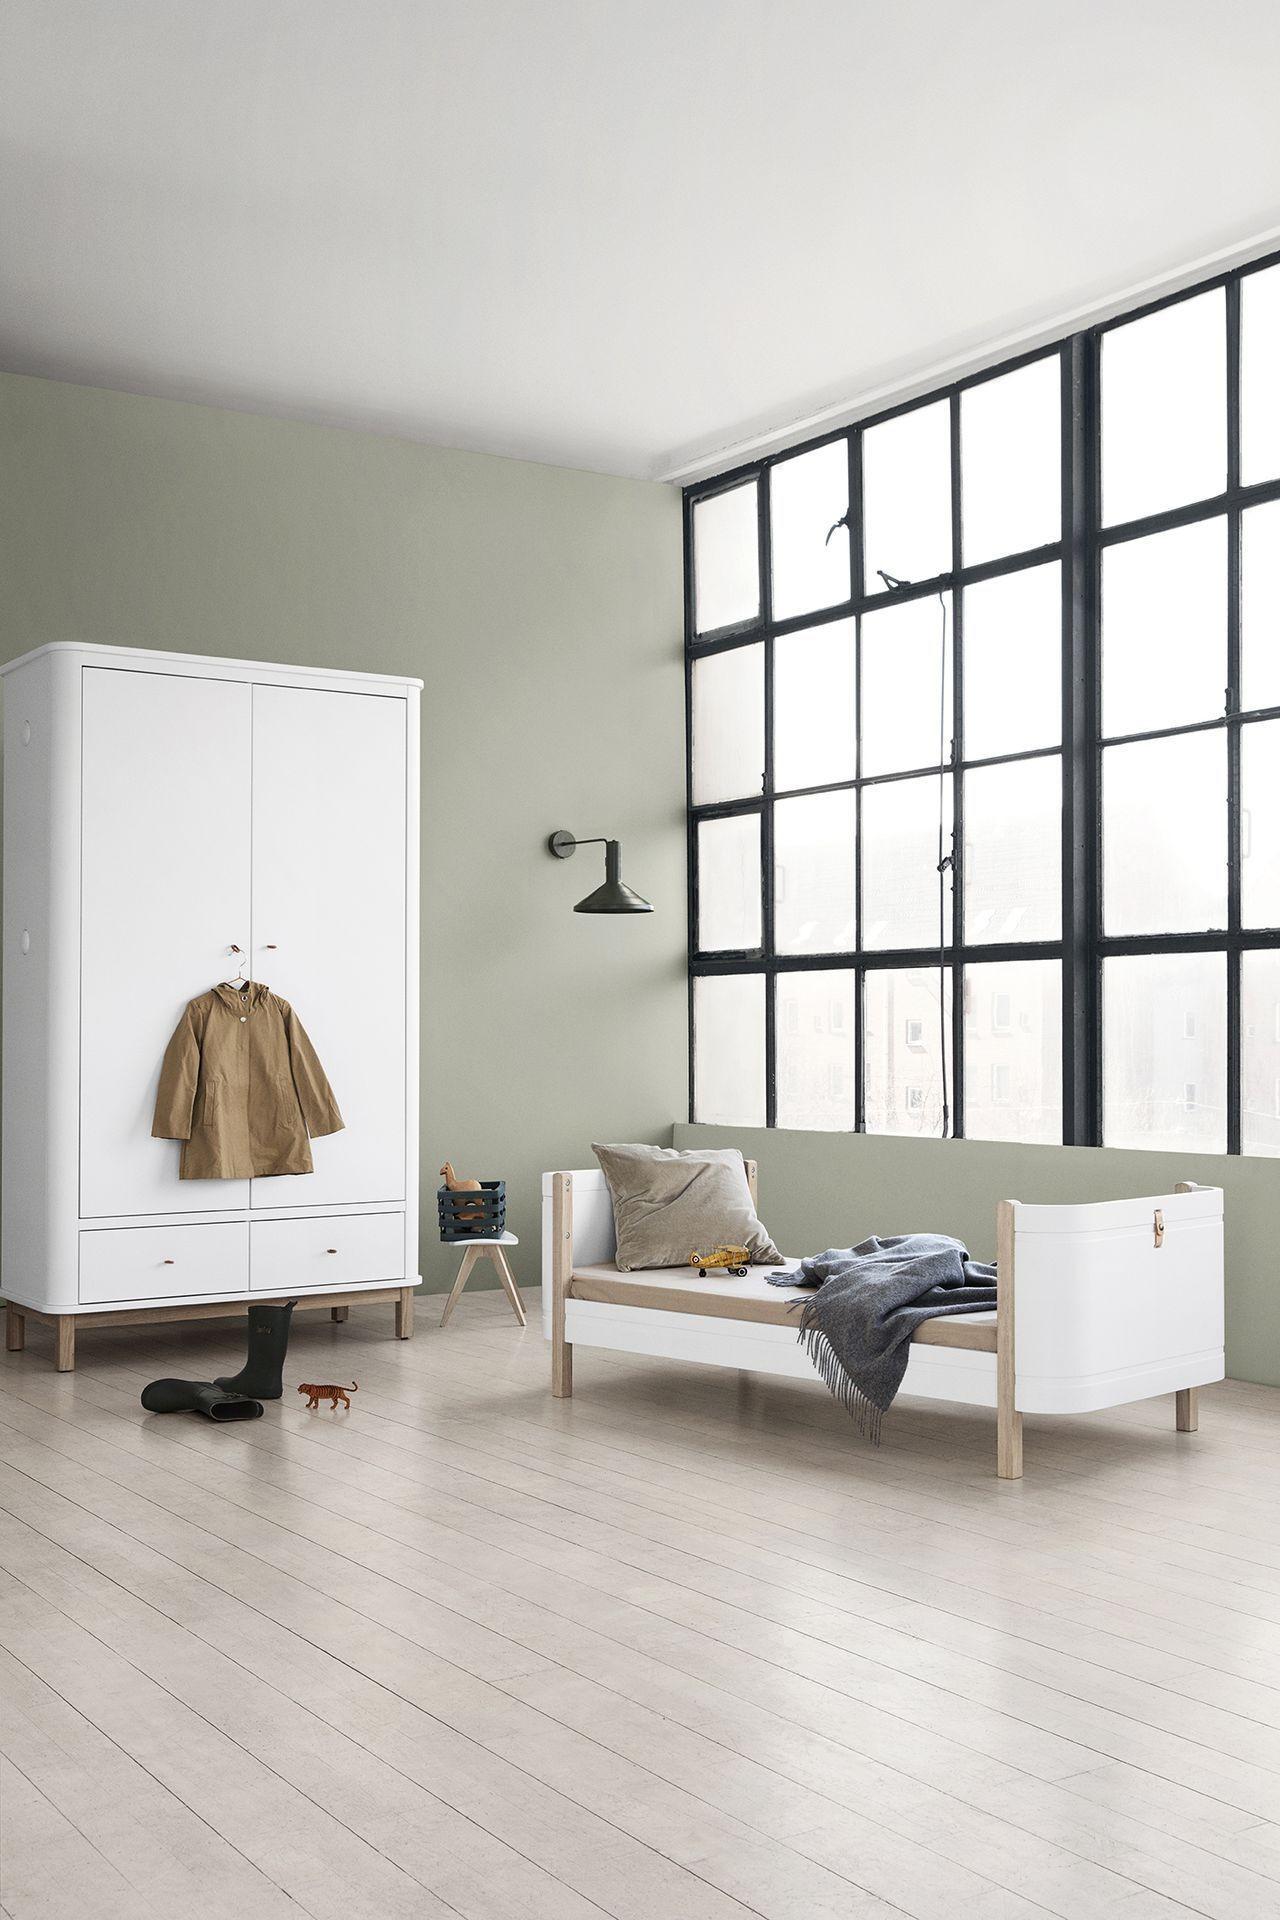 oliver furniture umbauset wood mini halbhohes hochbett zum mini juniorbett kleine fabriek - Oliver Furniture Hochbett